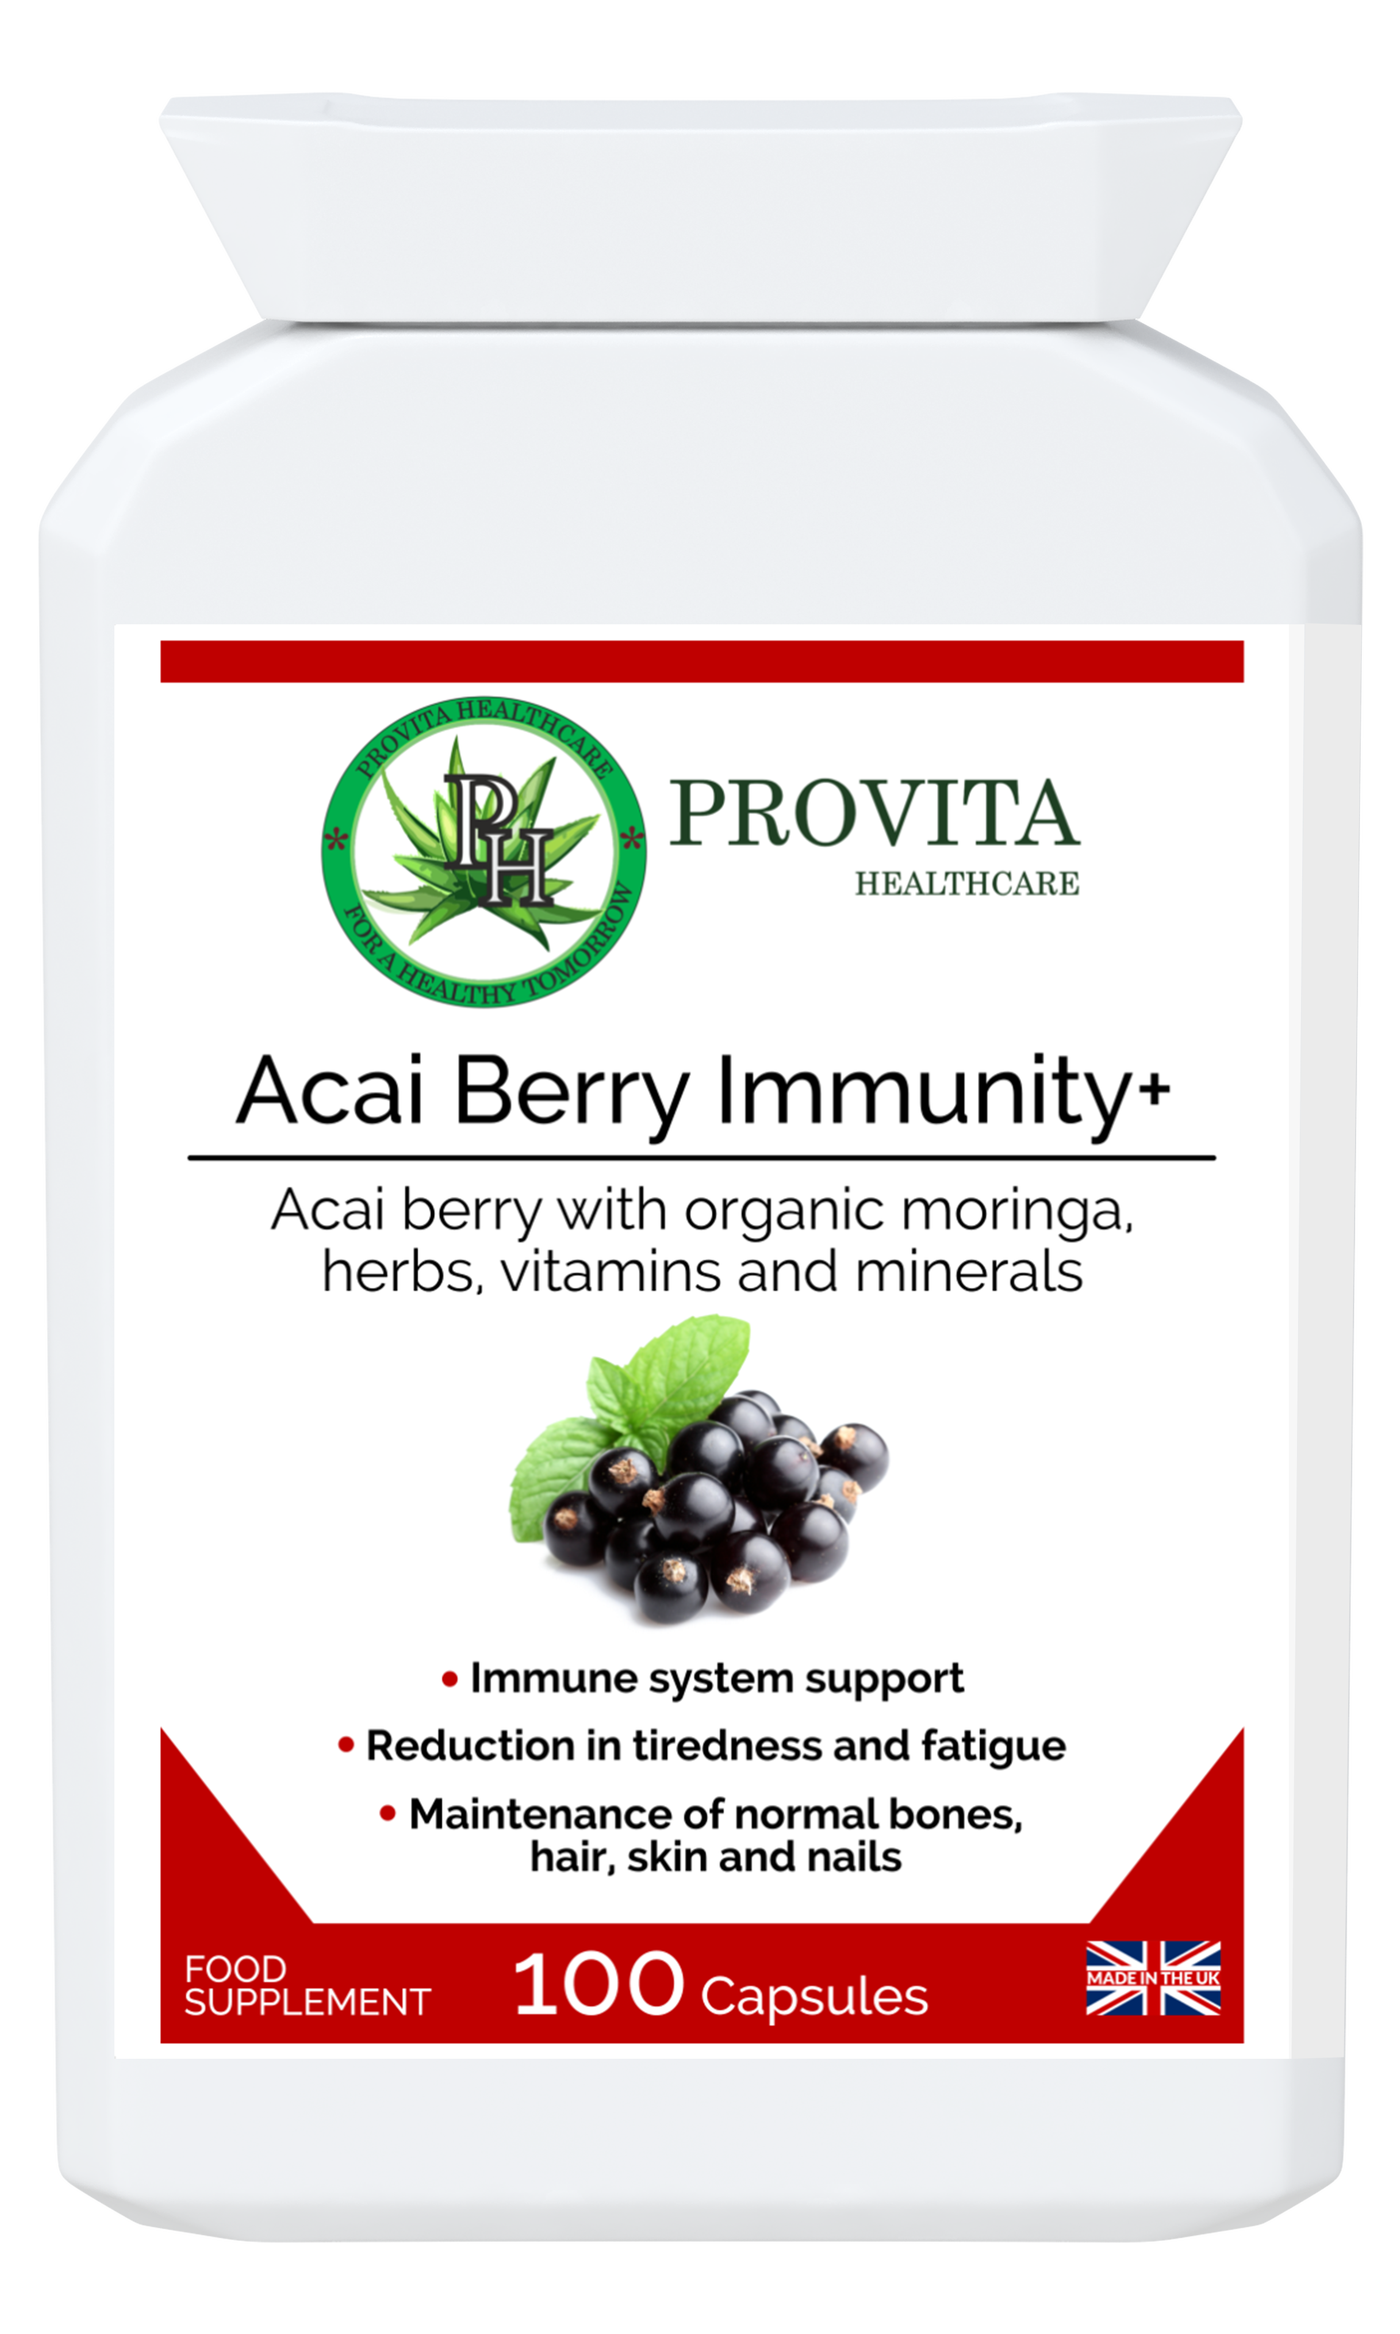 Acai Berry Immunity+